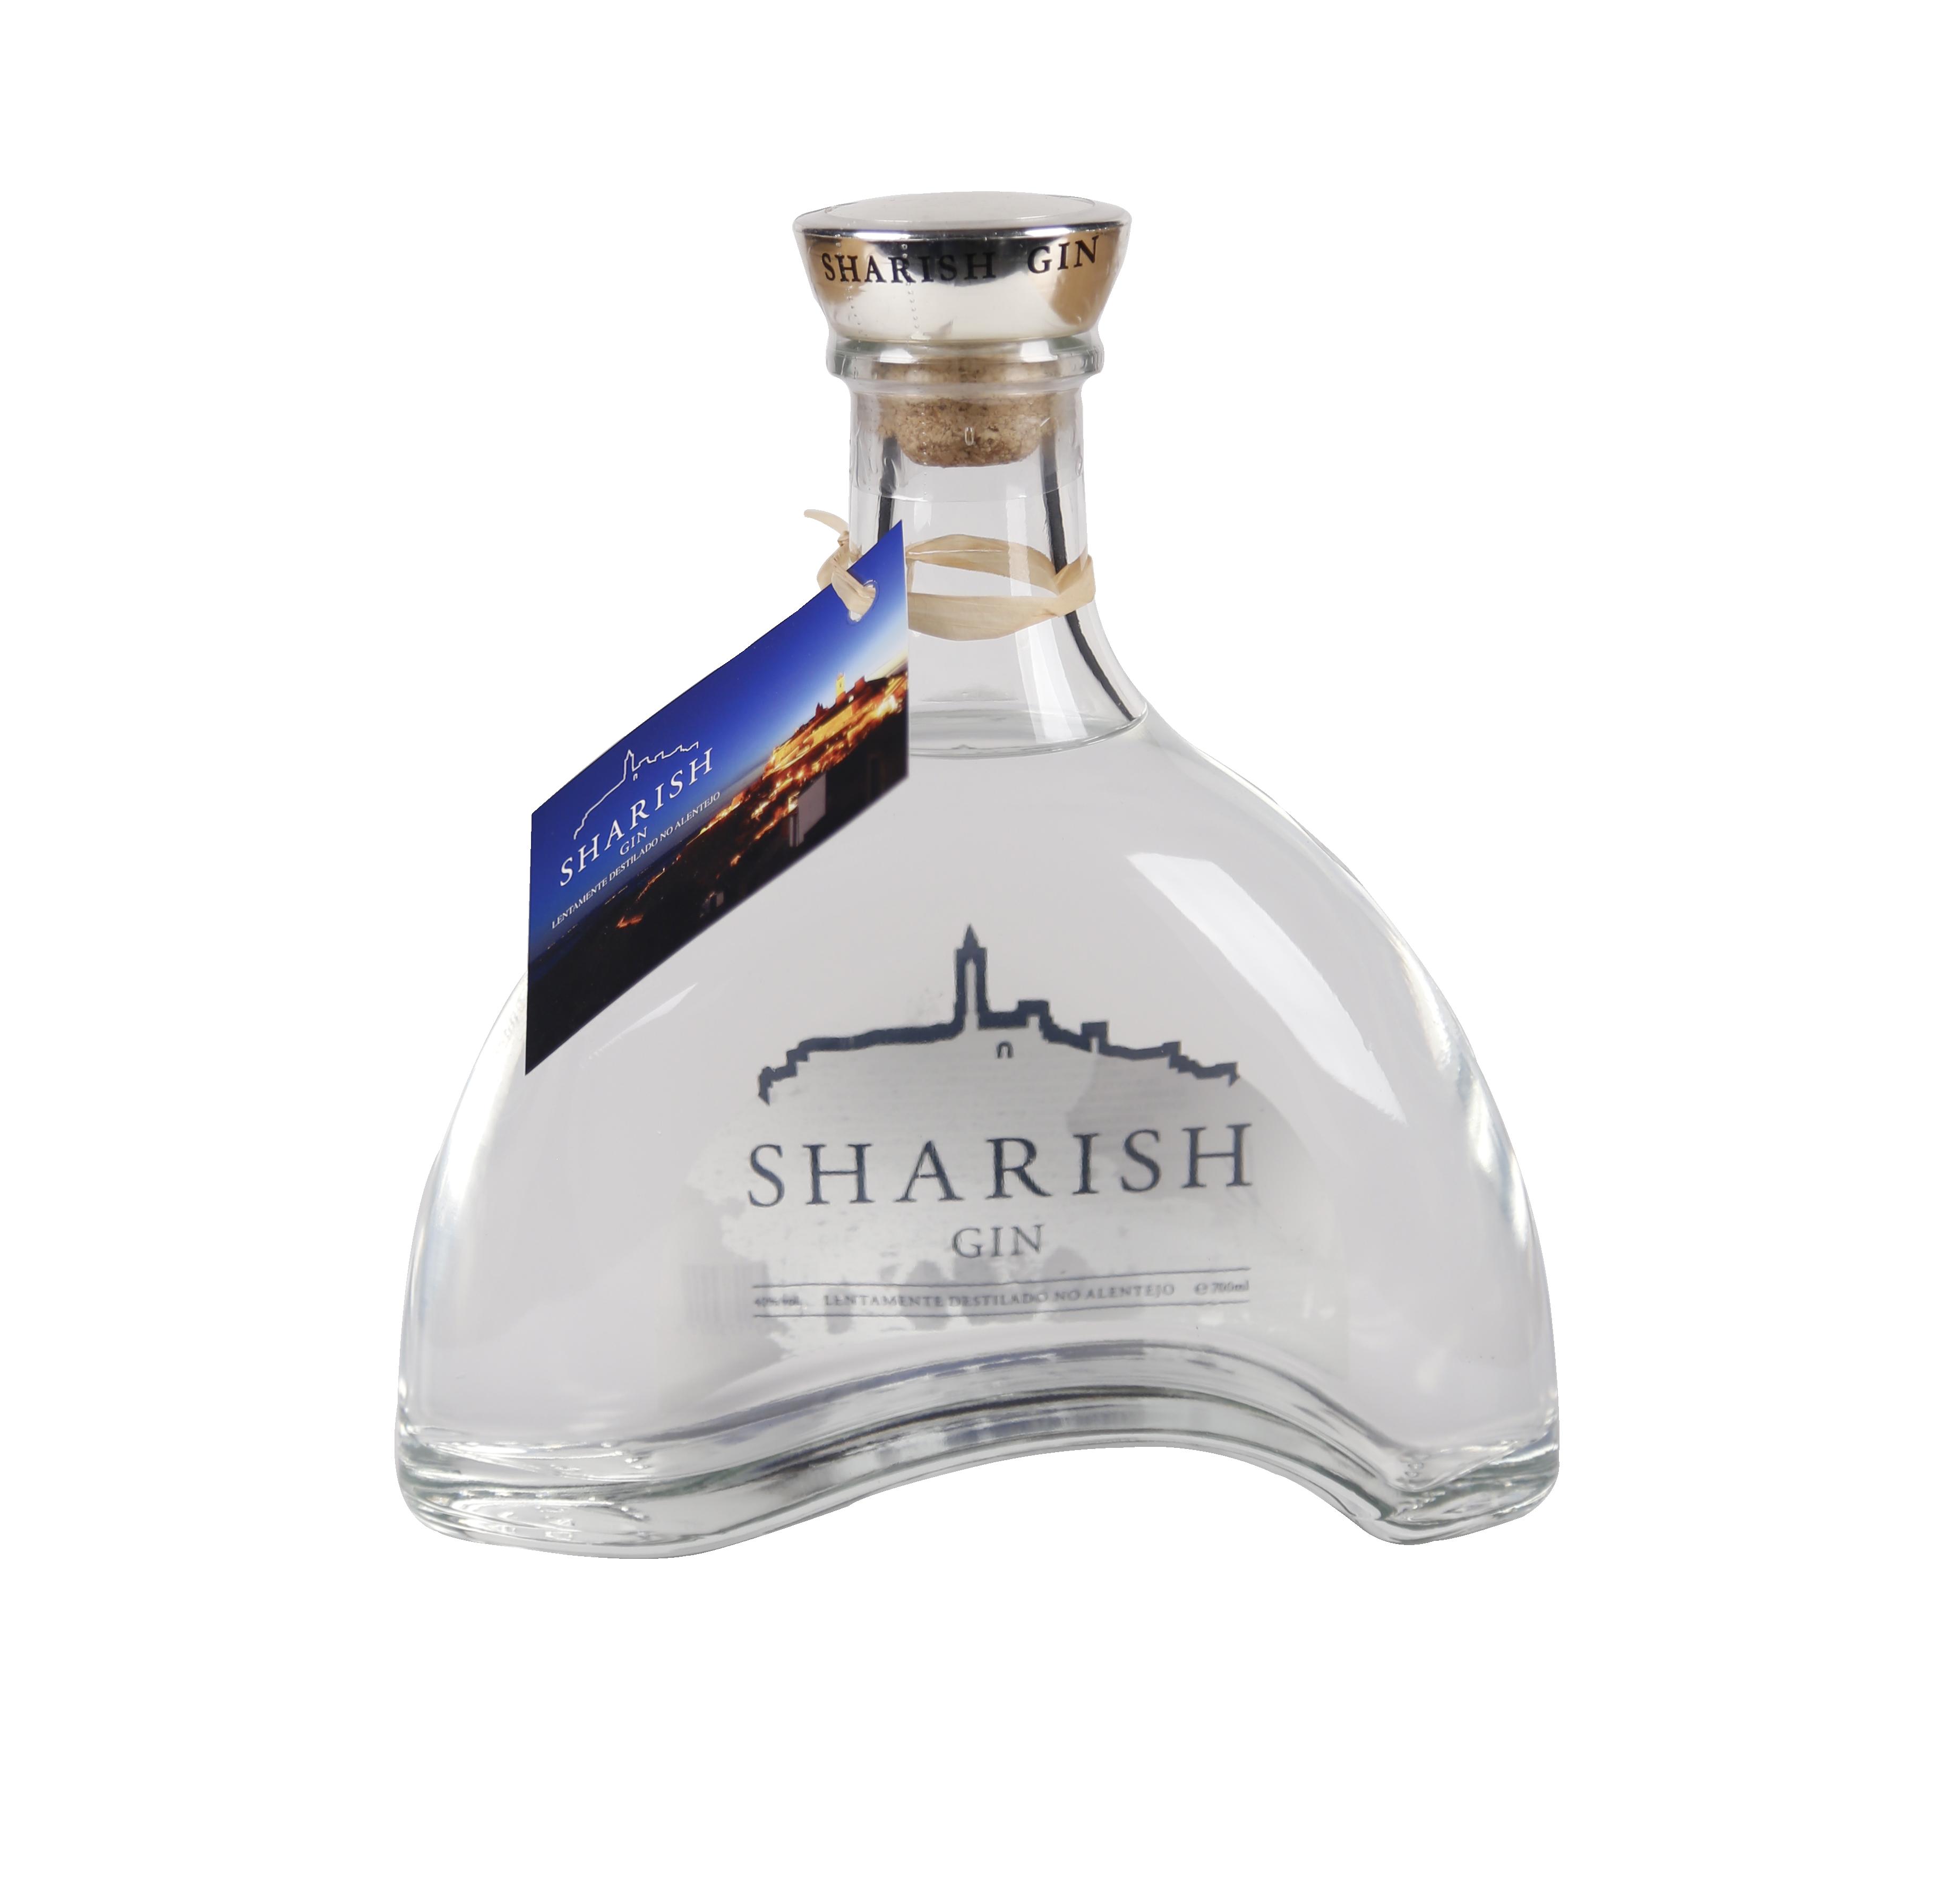 SHARISH 薩瑞斯原創琴酒